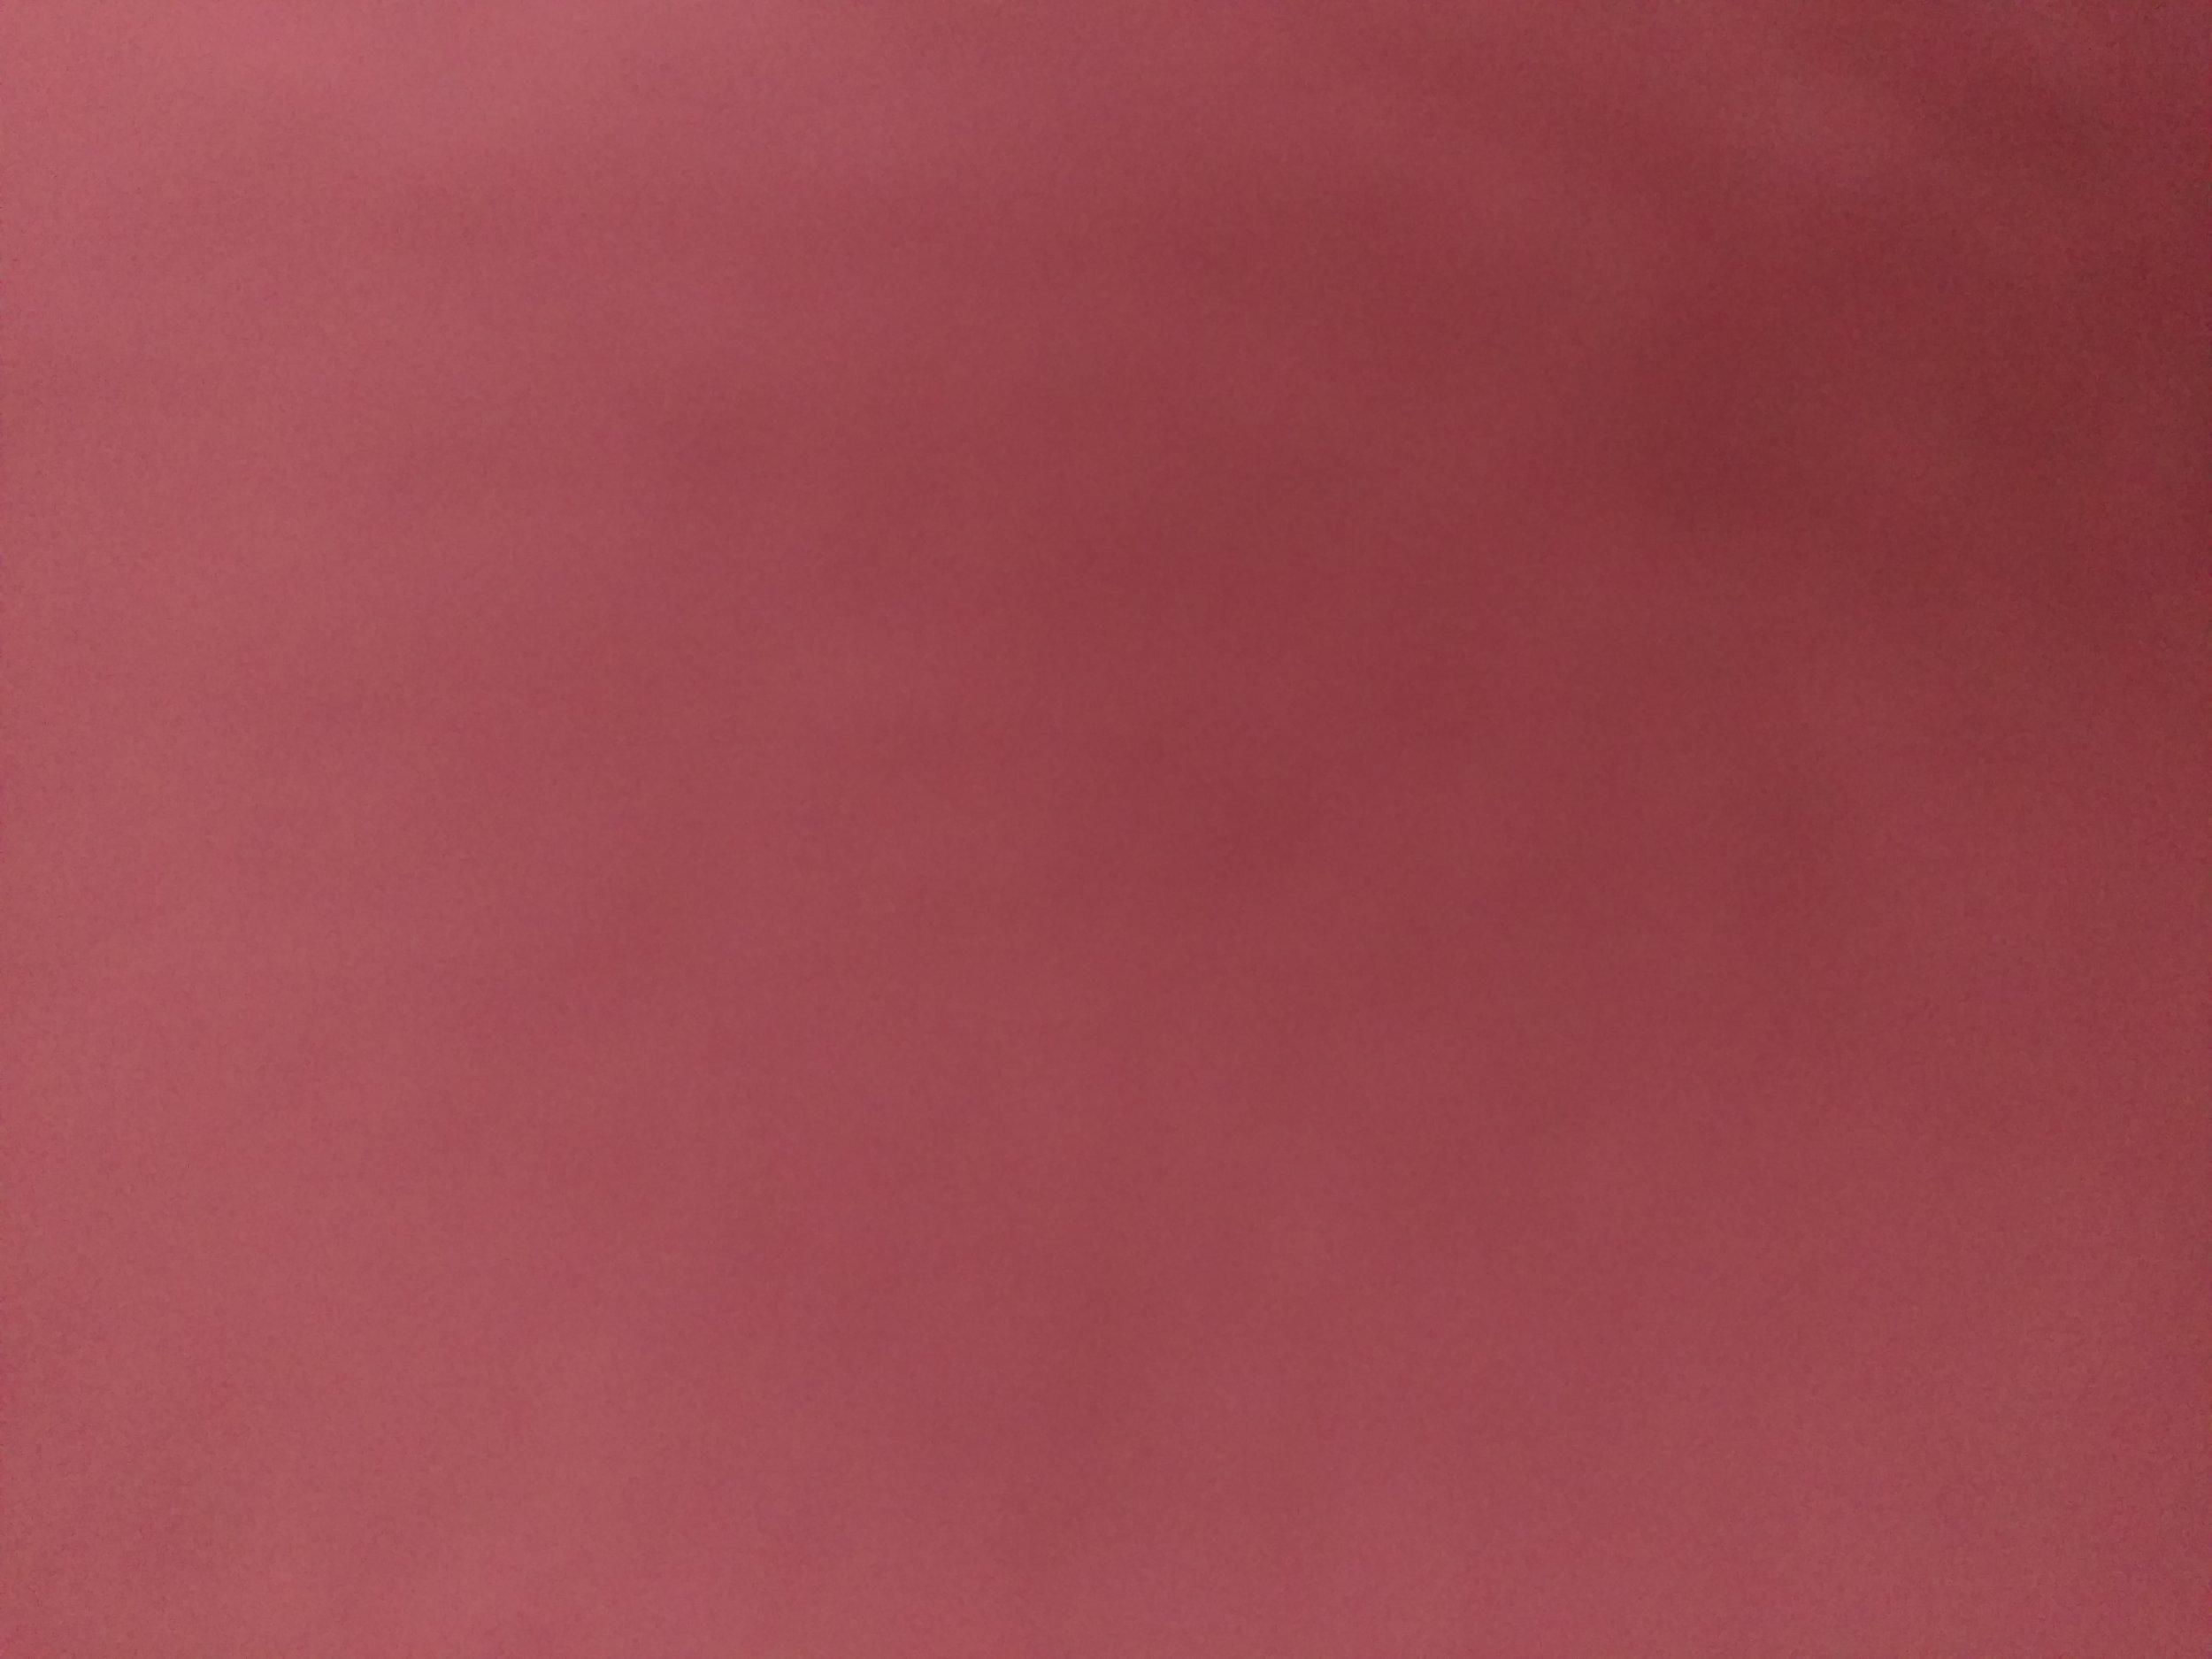 willroth-co-free-texture-gradient-090.jpg